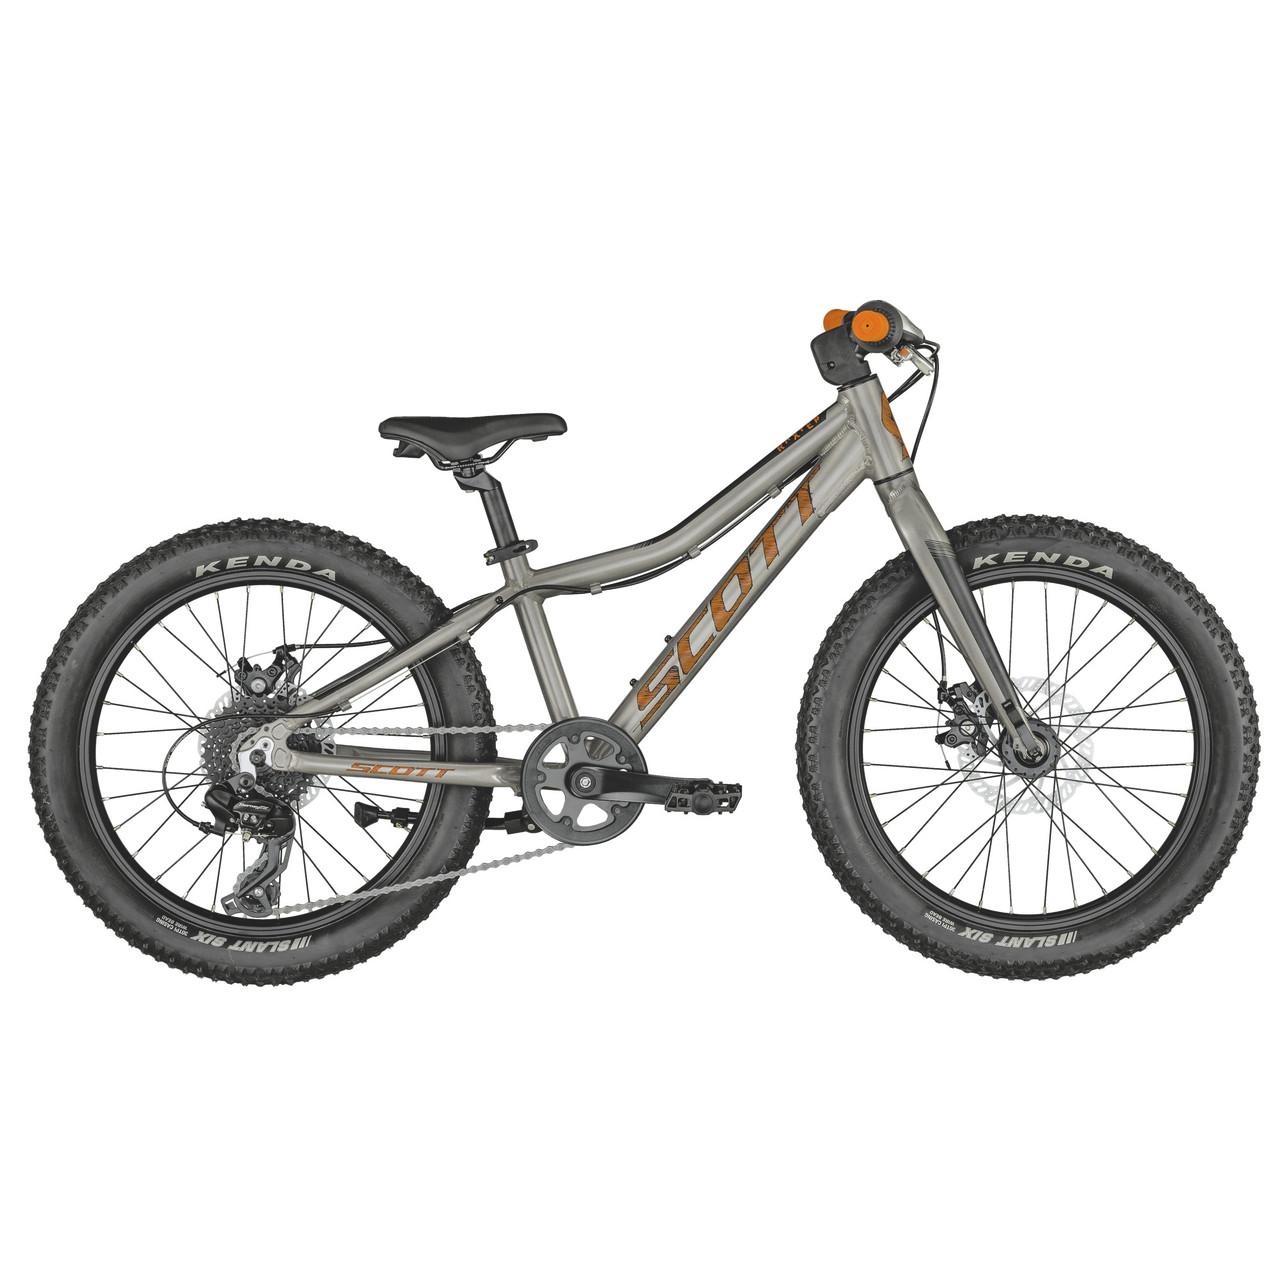 SCOTT ROXTER 20 RAW ALLOY BIKE.....Scott Bikes are pick up only in store at Hunter Bikeworx fully assembled